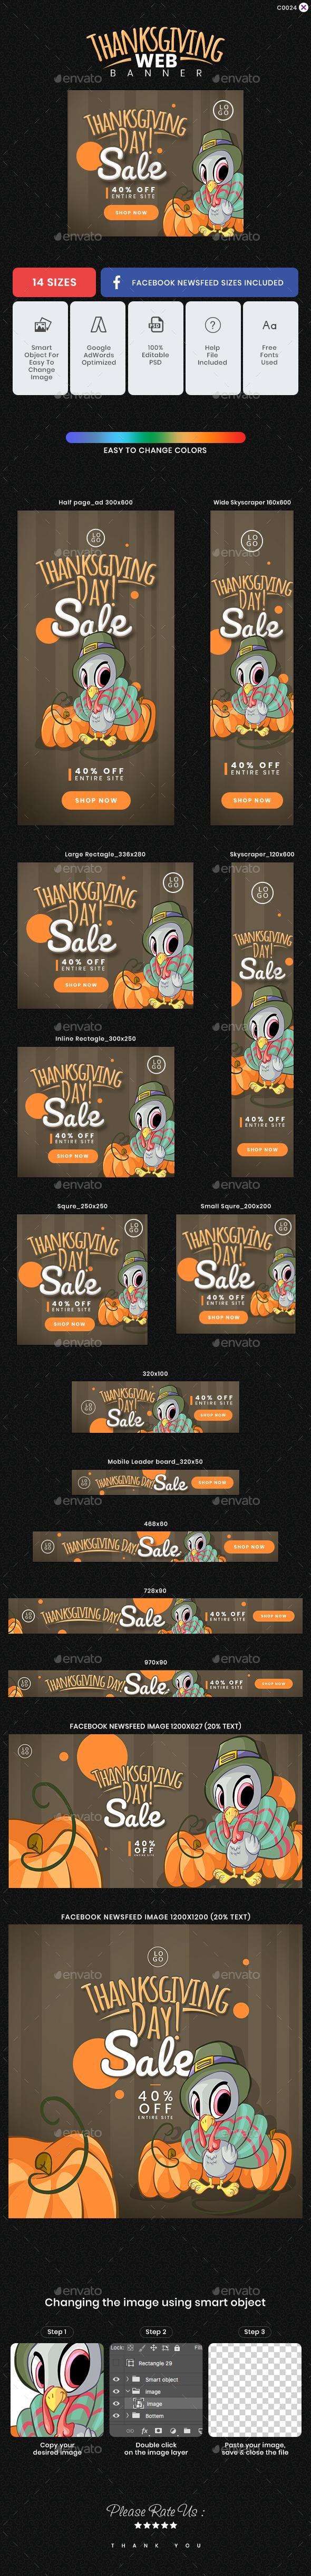 Thanksgiving Sale Web Banner Set - Banners & Ads Web Elements